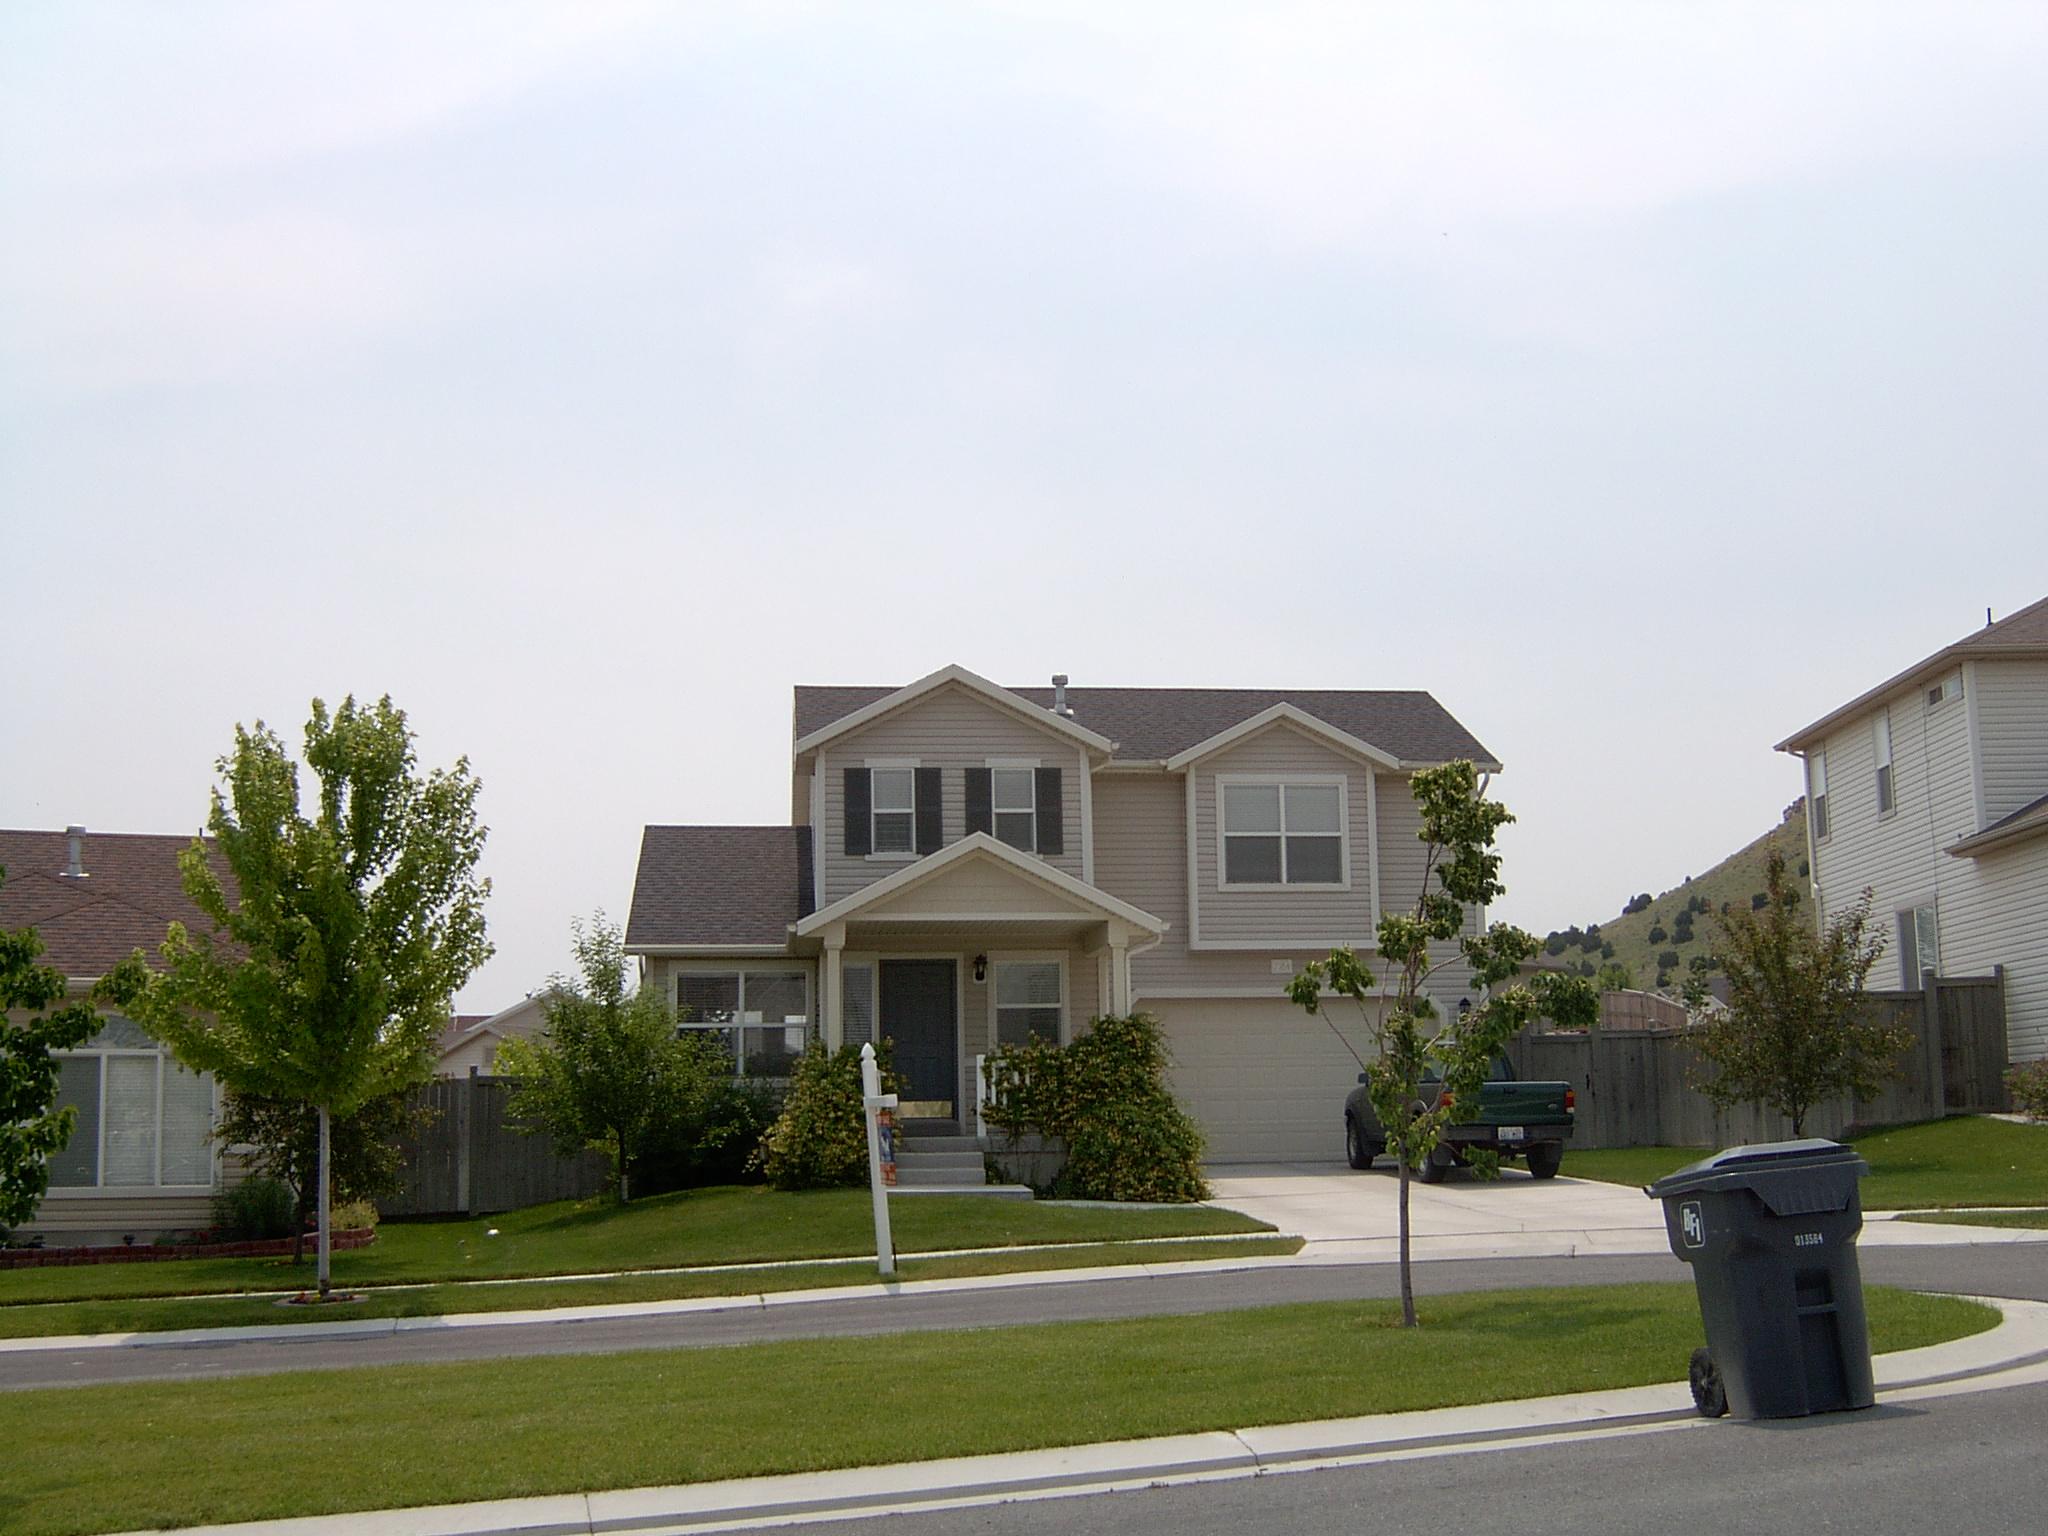 2005-1559P.JPG